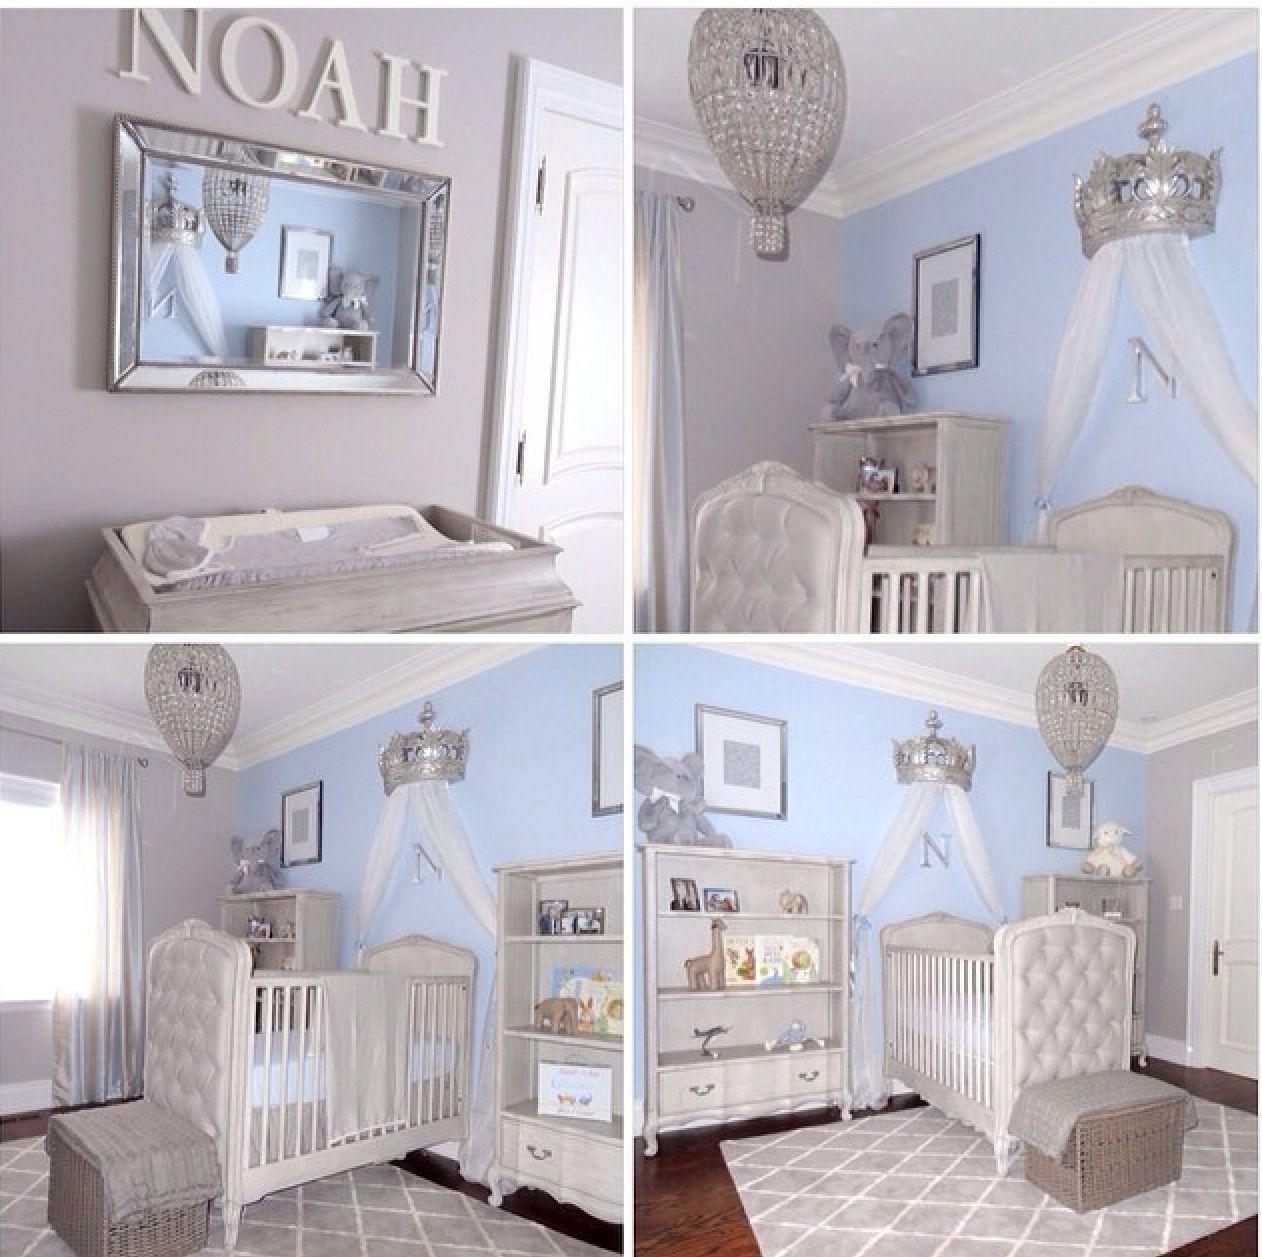 Nice Baby Boy Nursery Themes Ideas Tips 2016: OMG Love This Perfect Baby Nursery. So Adorable. Blue